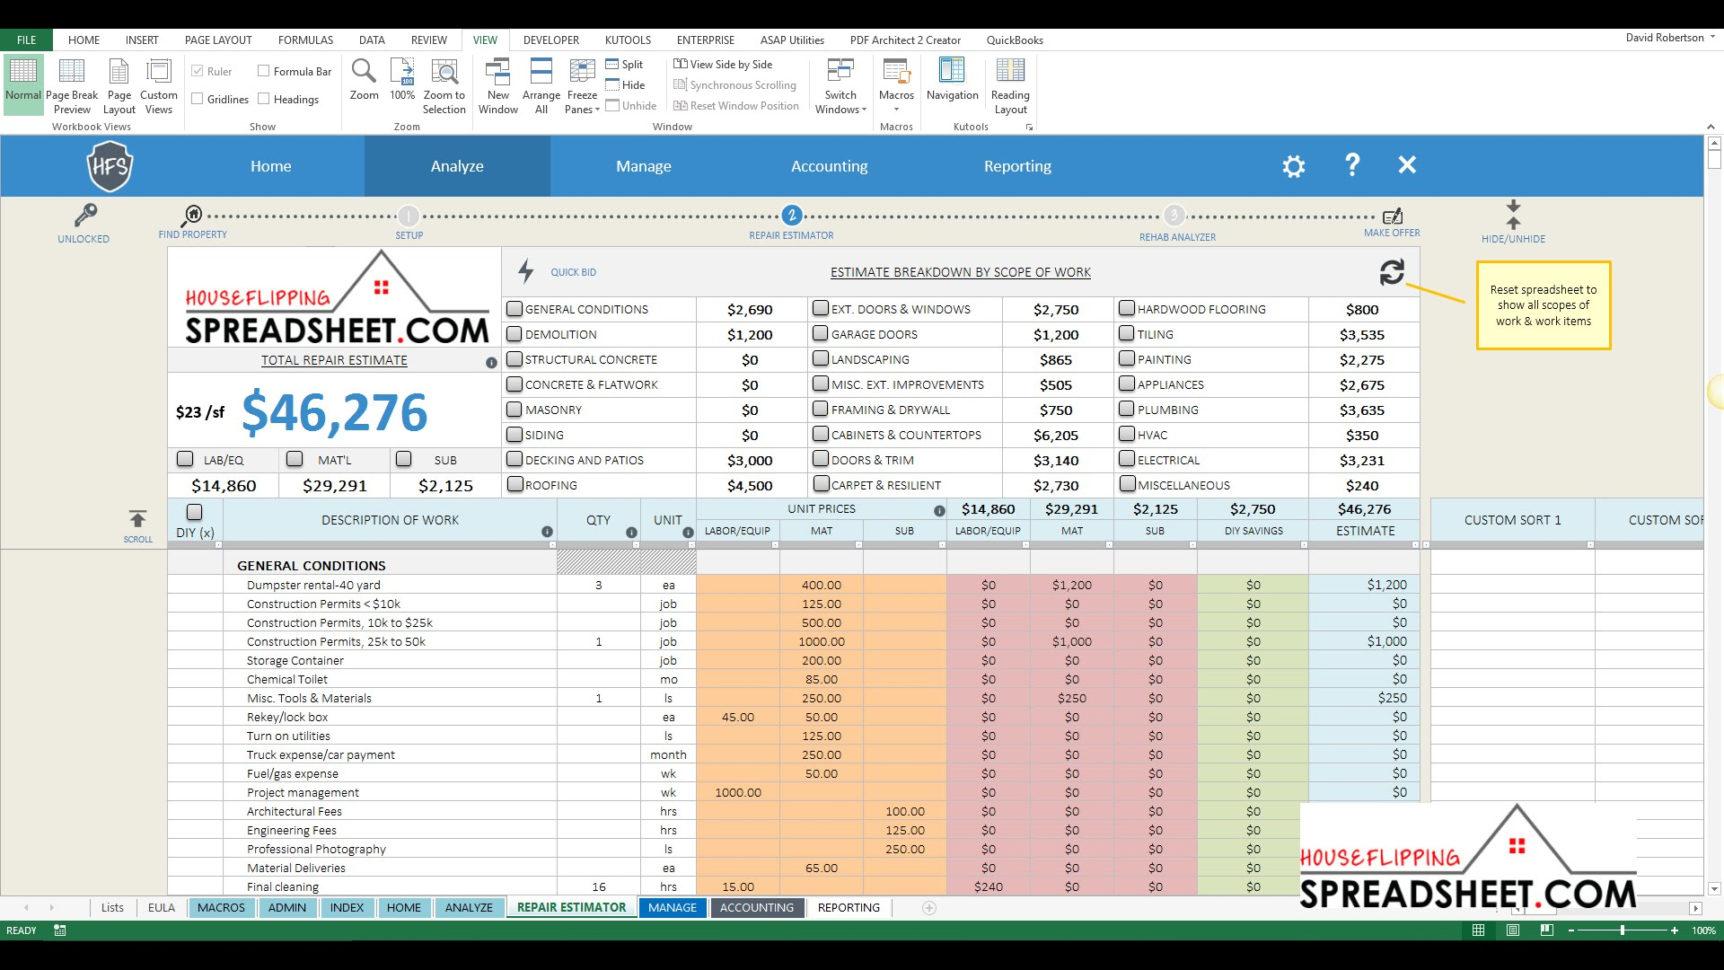 House Flipping Budget Spreadsheet Template With Sheet Houseg Spreadsheet Template On Software Monthly Budget